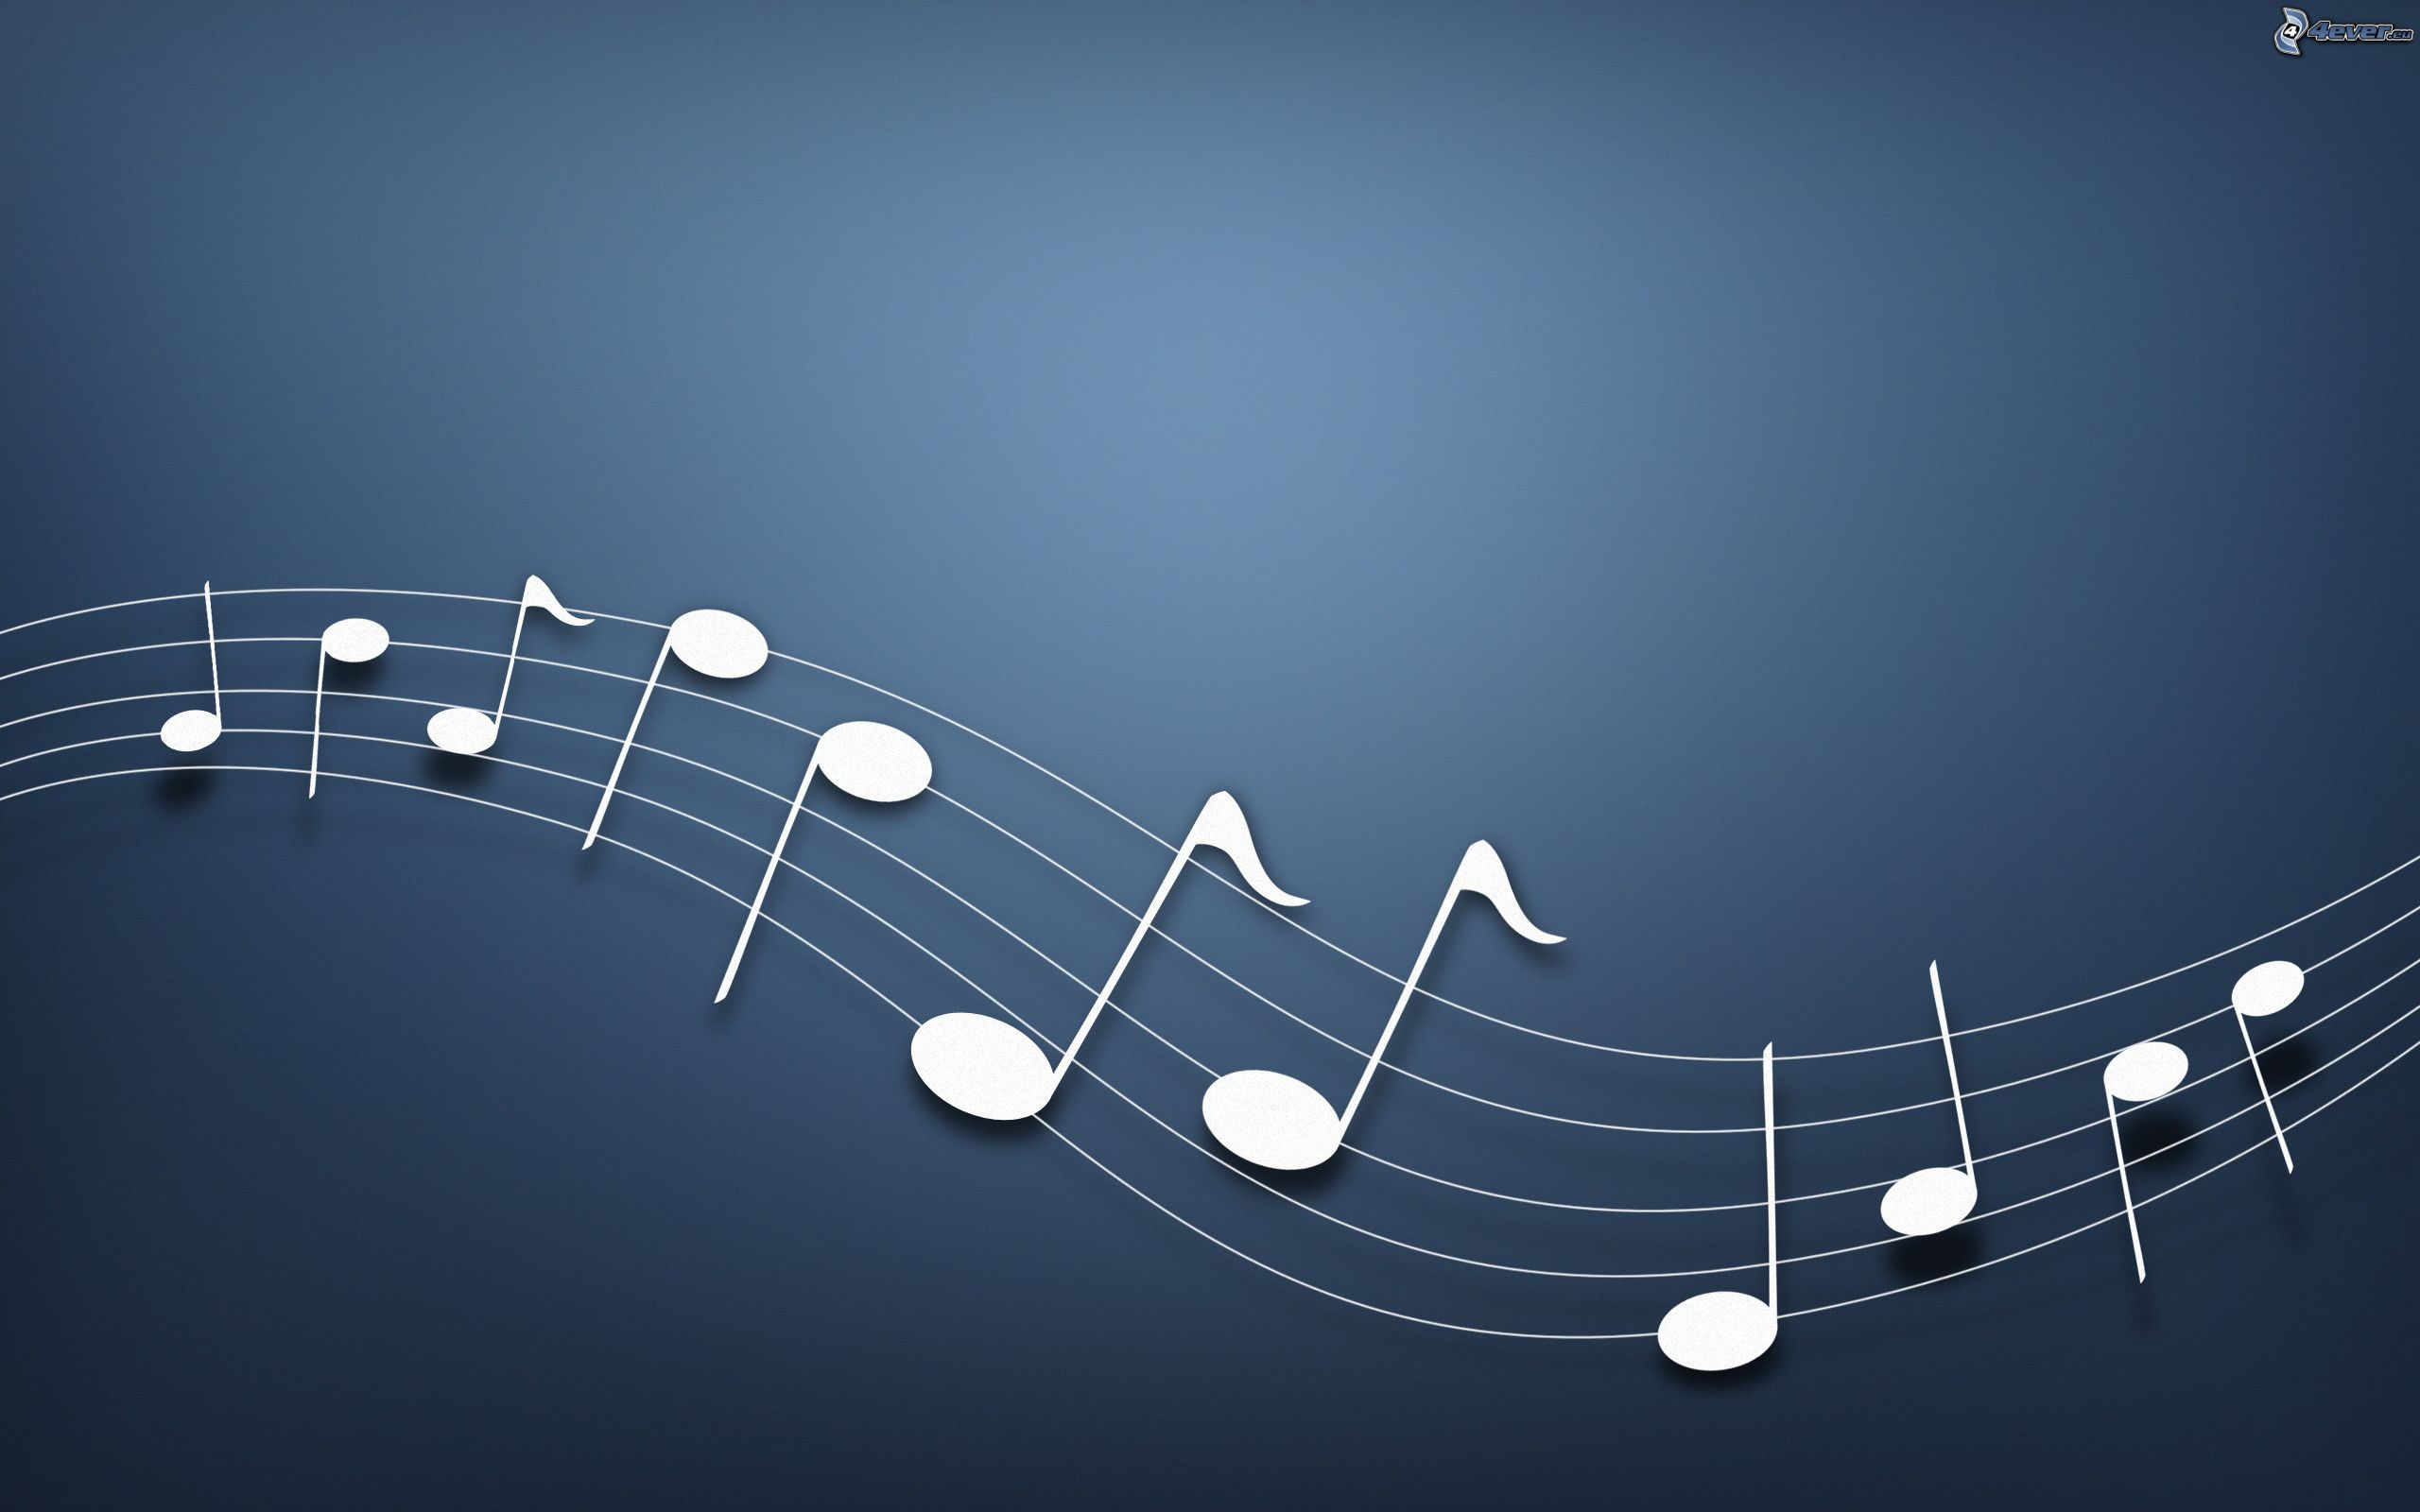 notas-de-musica,-fondo-azul-205757.jpg